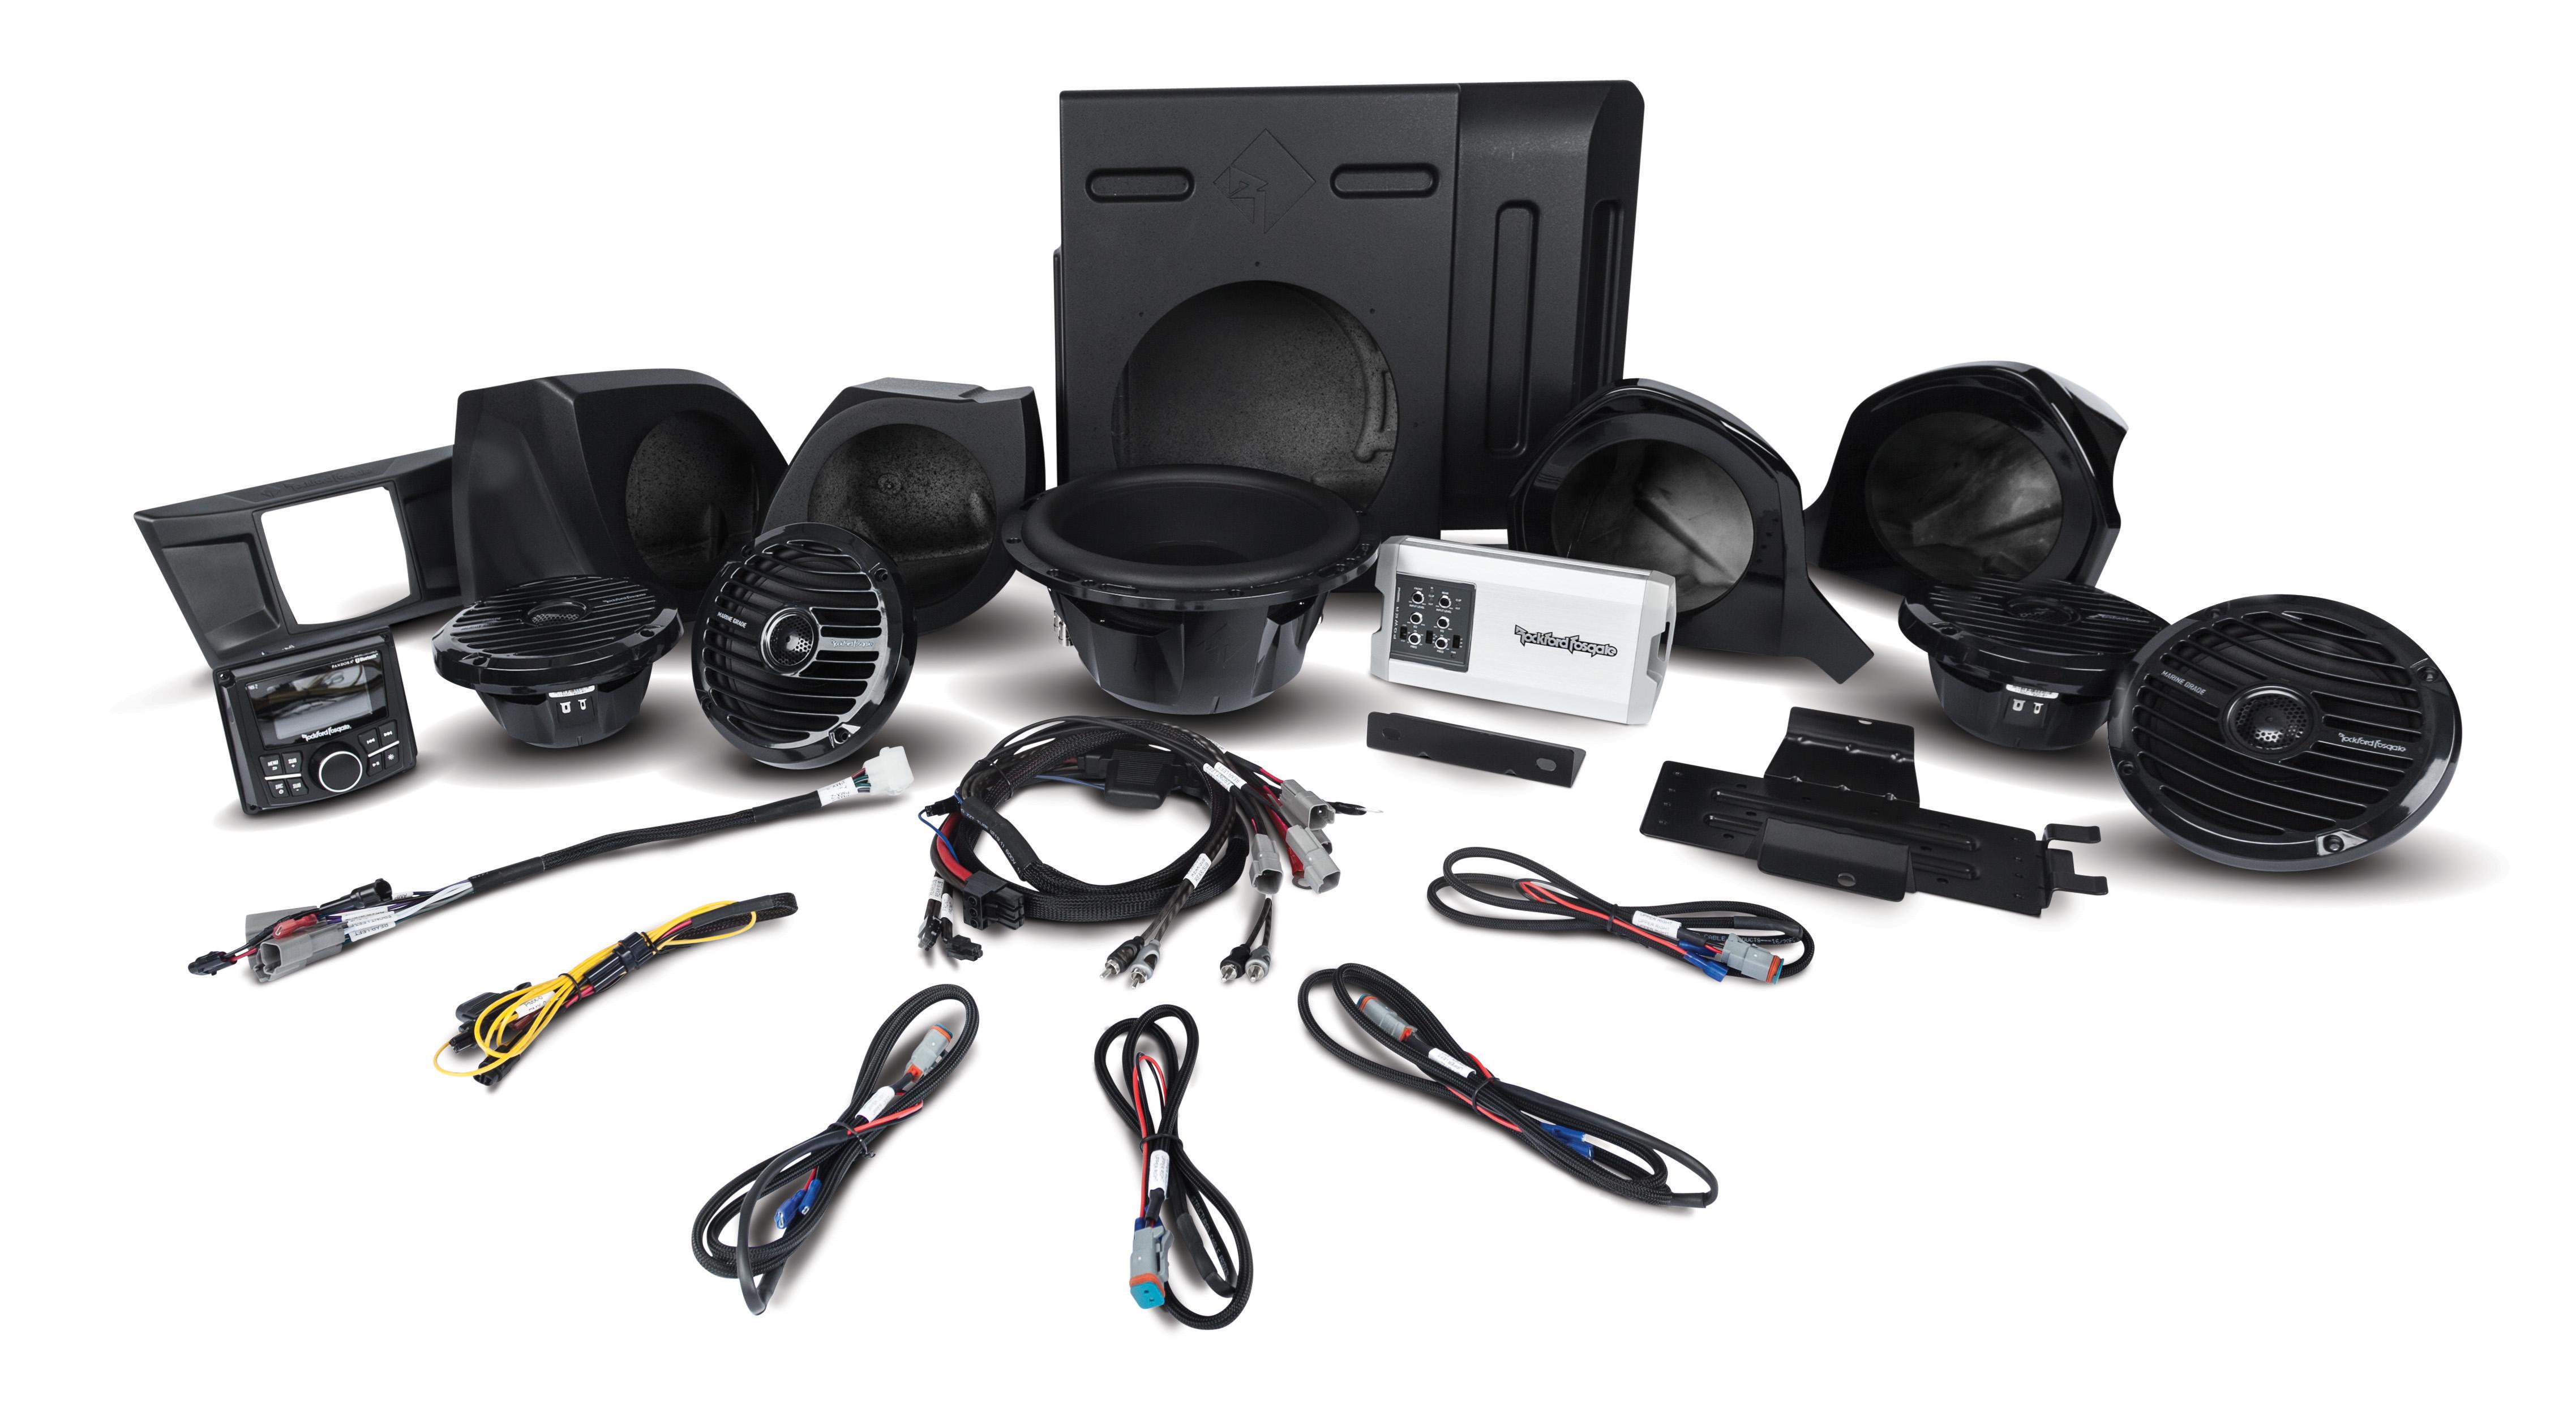 Rockford Fosgate T3652-S incar speakers REVIEW